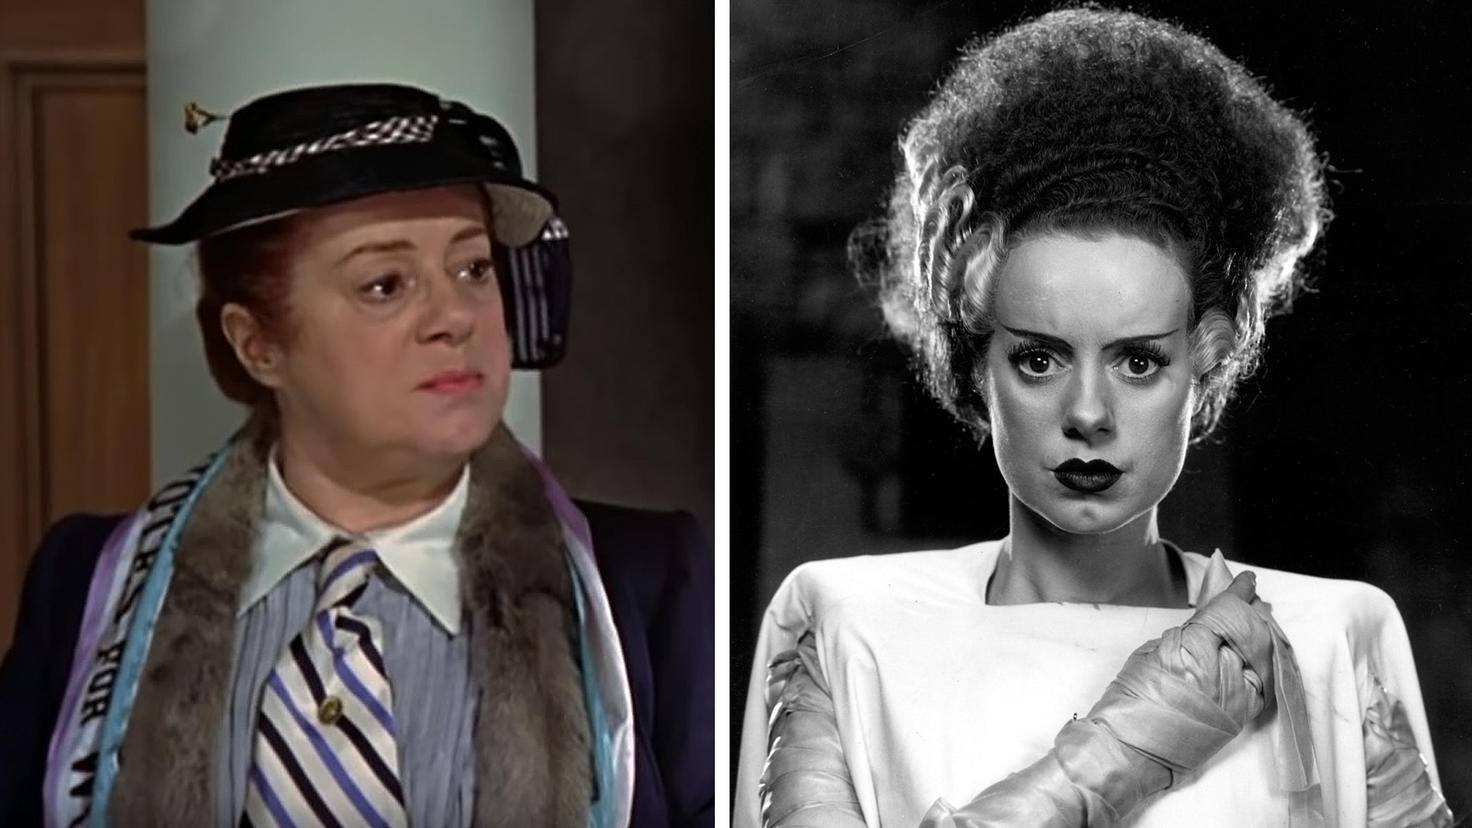 Bride of Frankenstein-Elsa Lanchester-picture alliance-Everett Collection-93128544-Mariy Poppins-Katie Nanna-Elsa Lanchester-Youtube-Disney FR